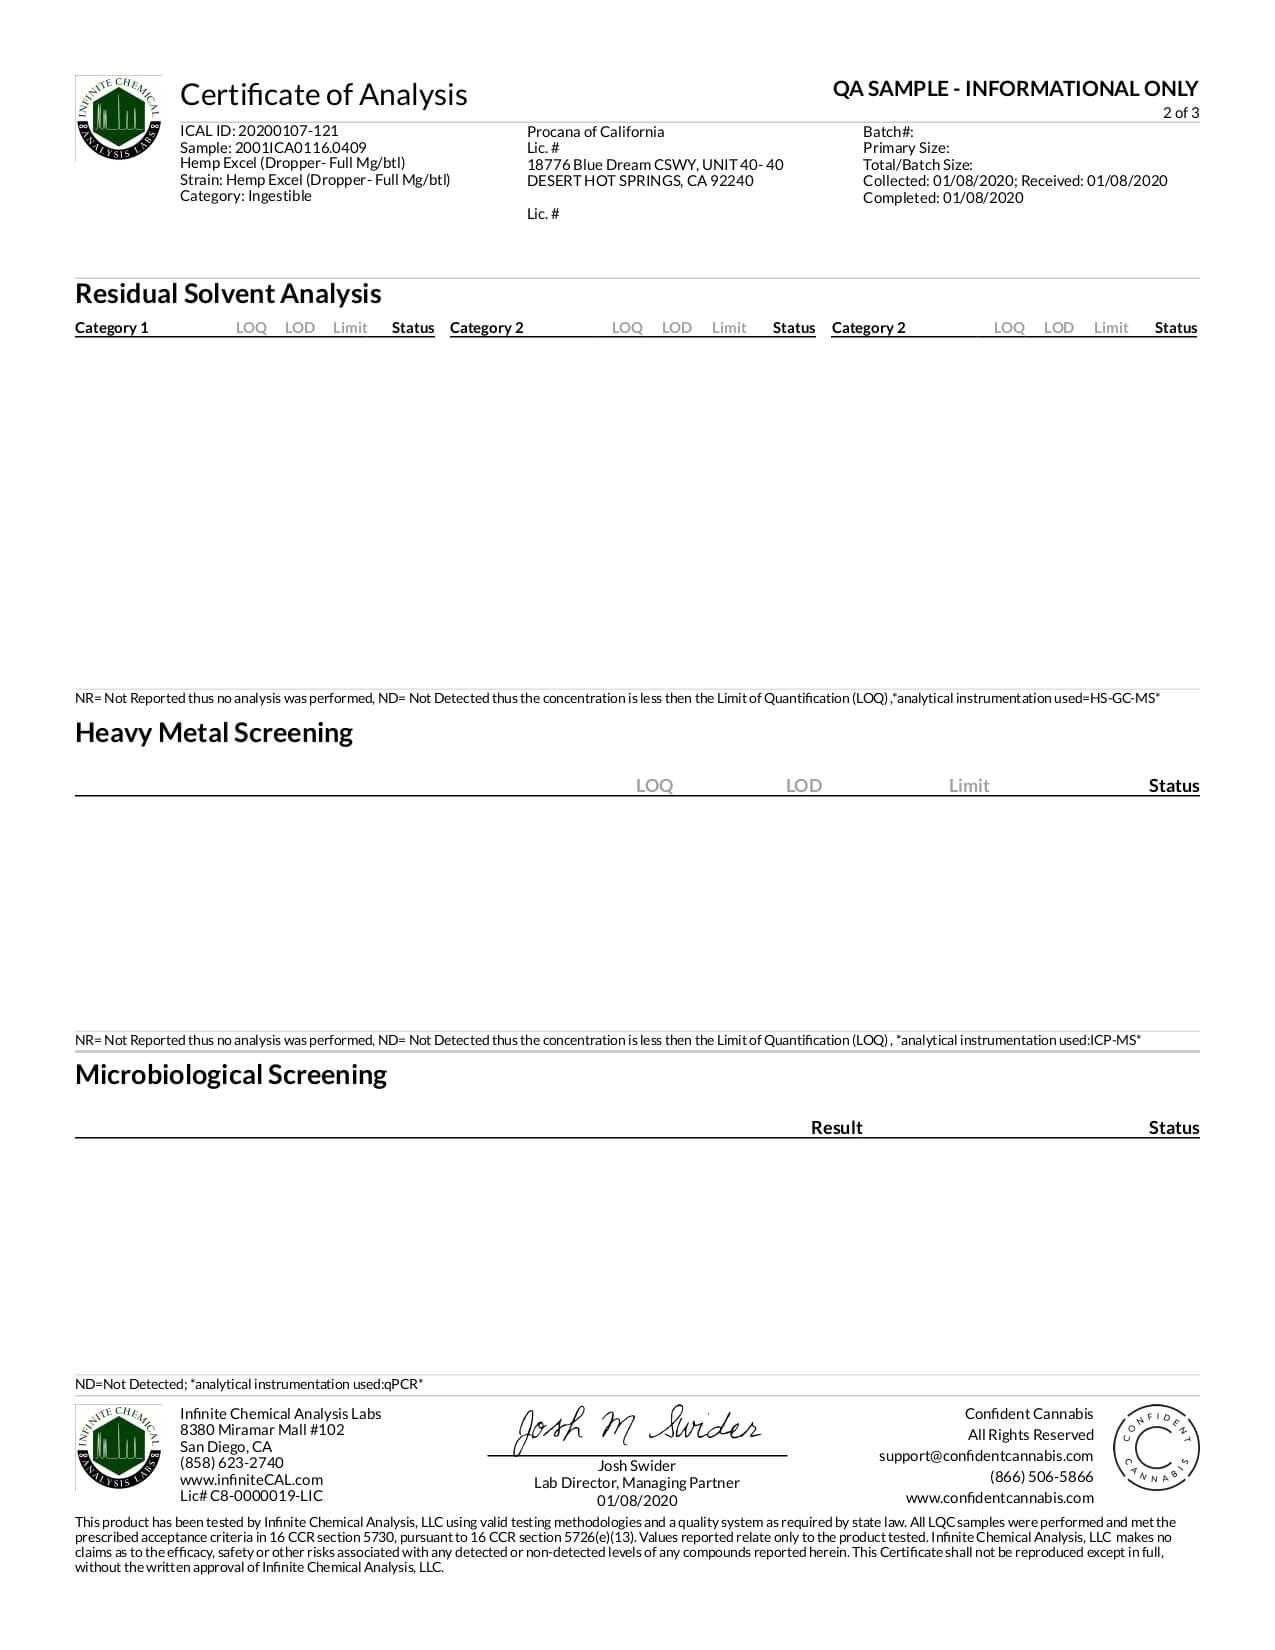 Procana CBD Vet Formula Softgels 240mg Lab Report